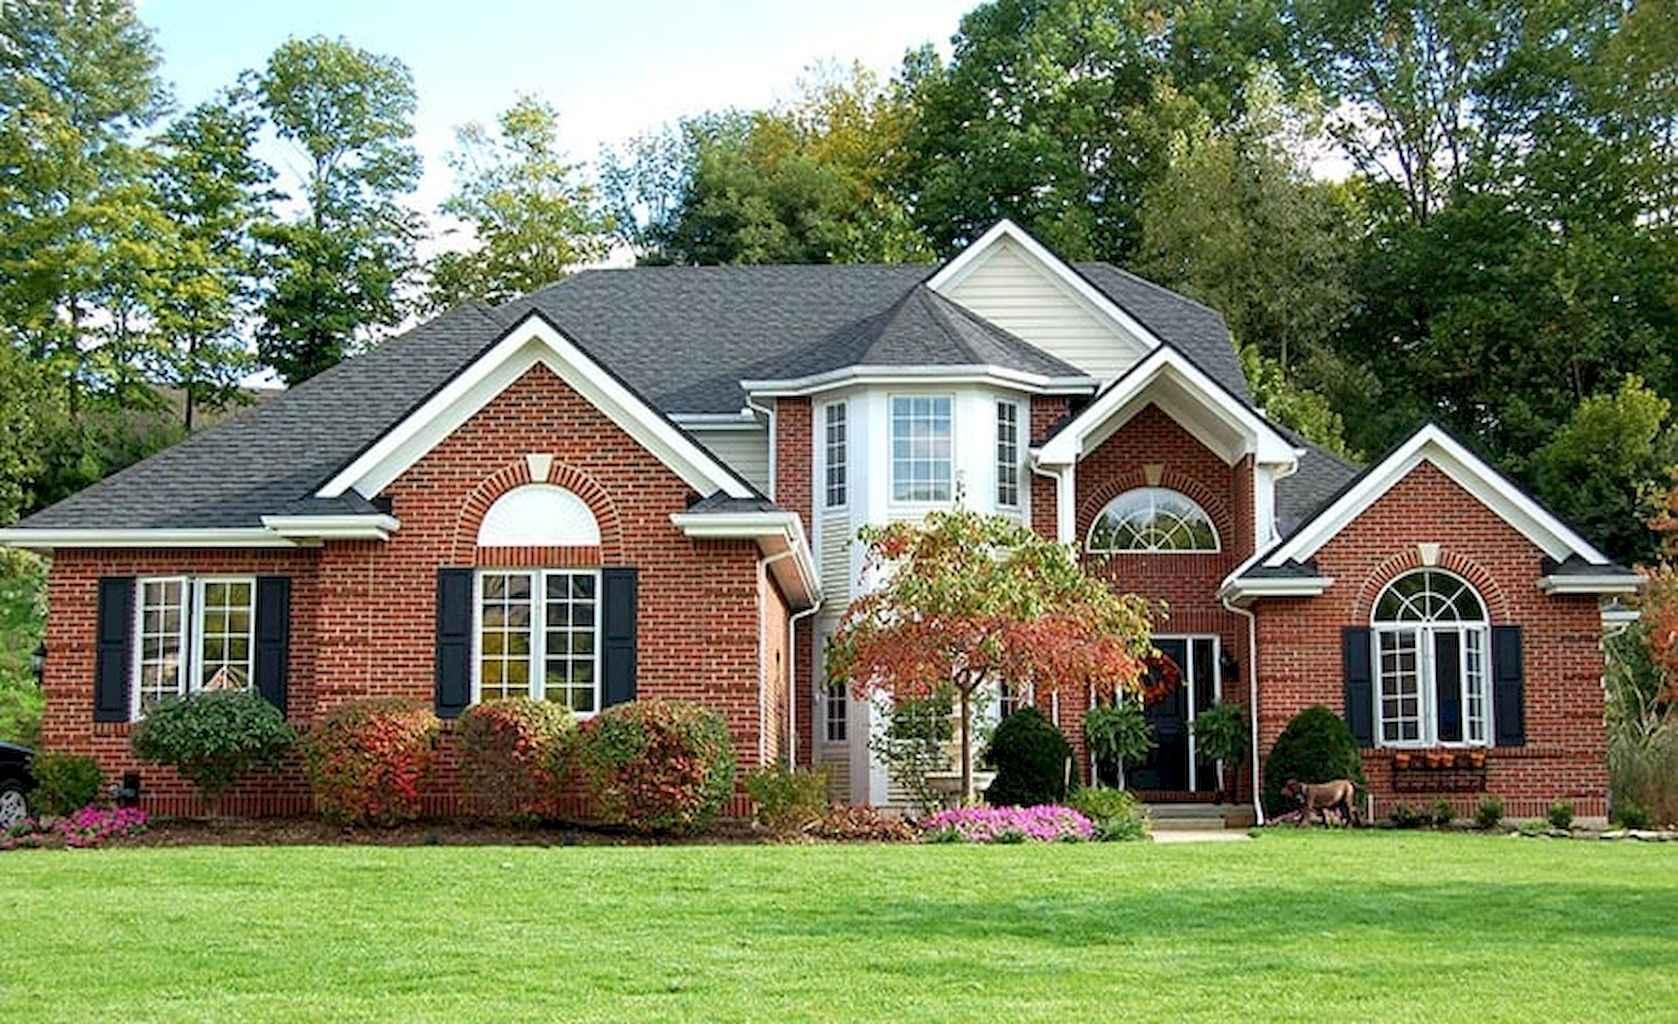 80 Amazing Plantation Homes Farmhouse Design Ideas (53)